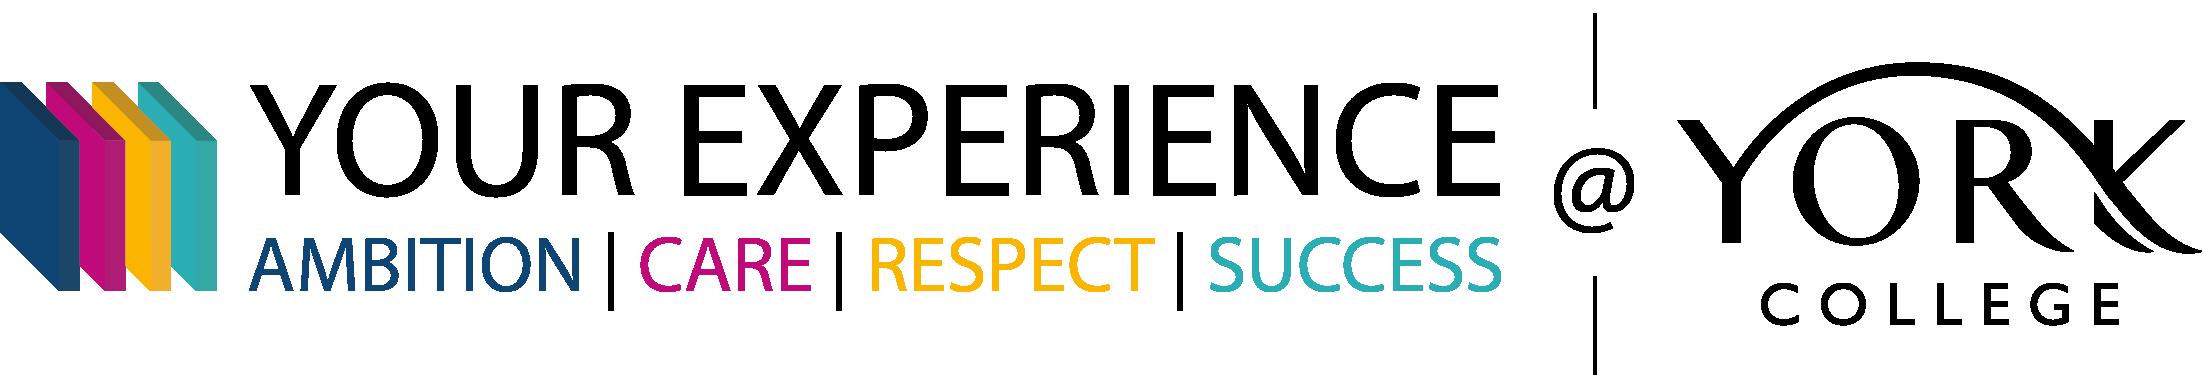 New Student Service Logo V2